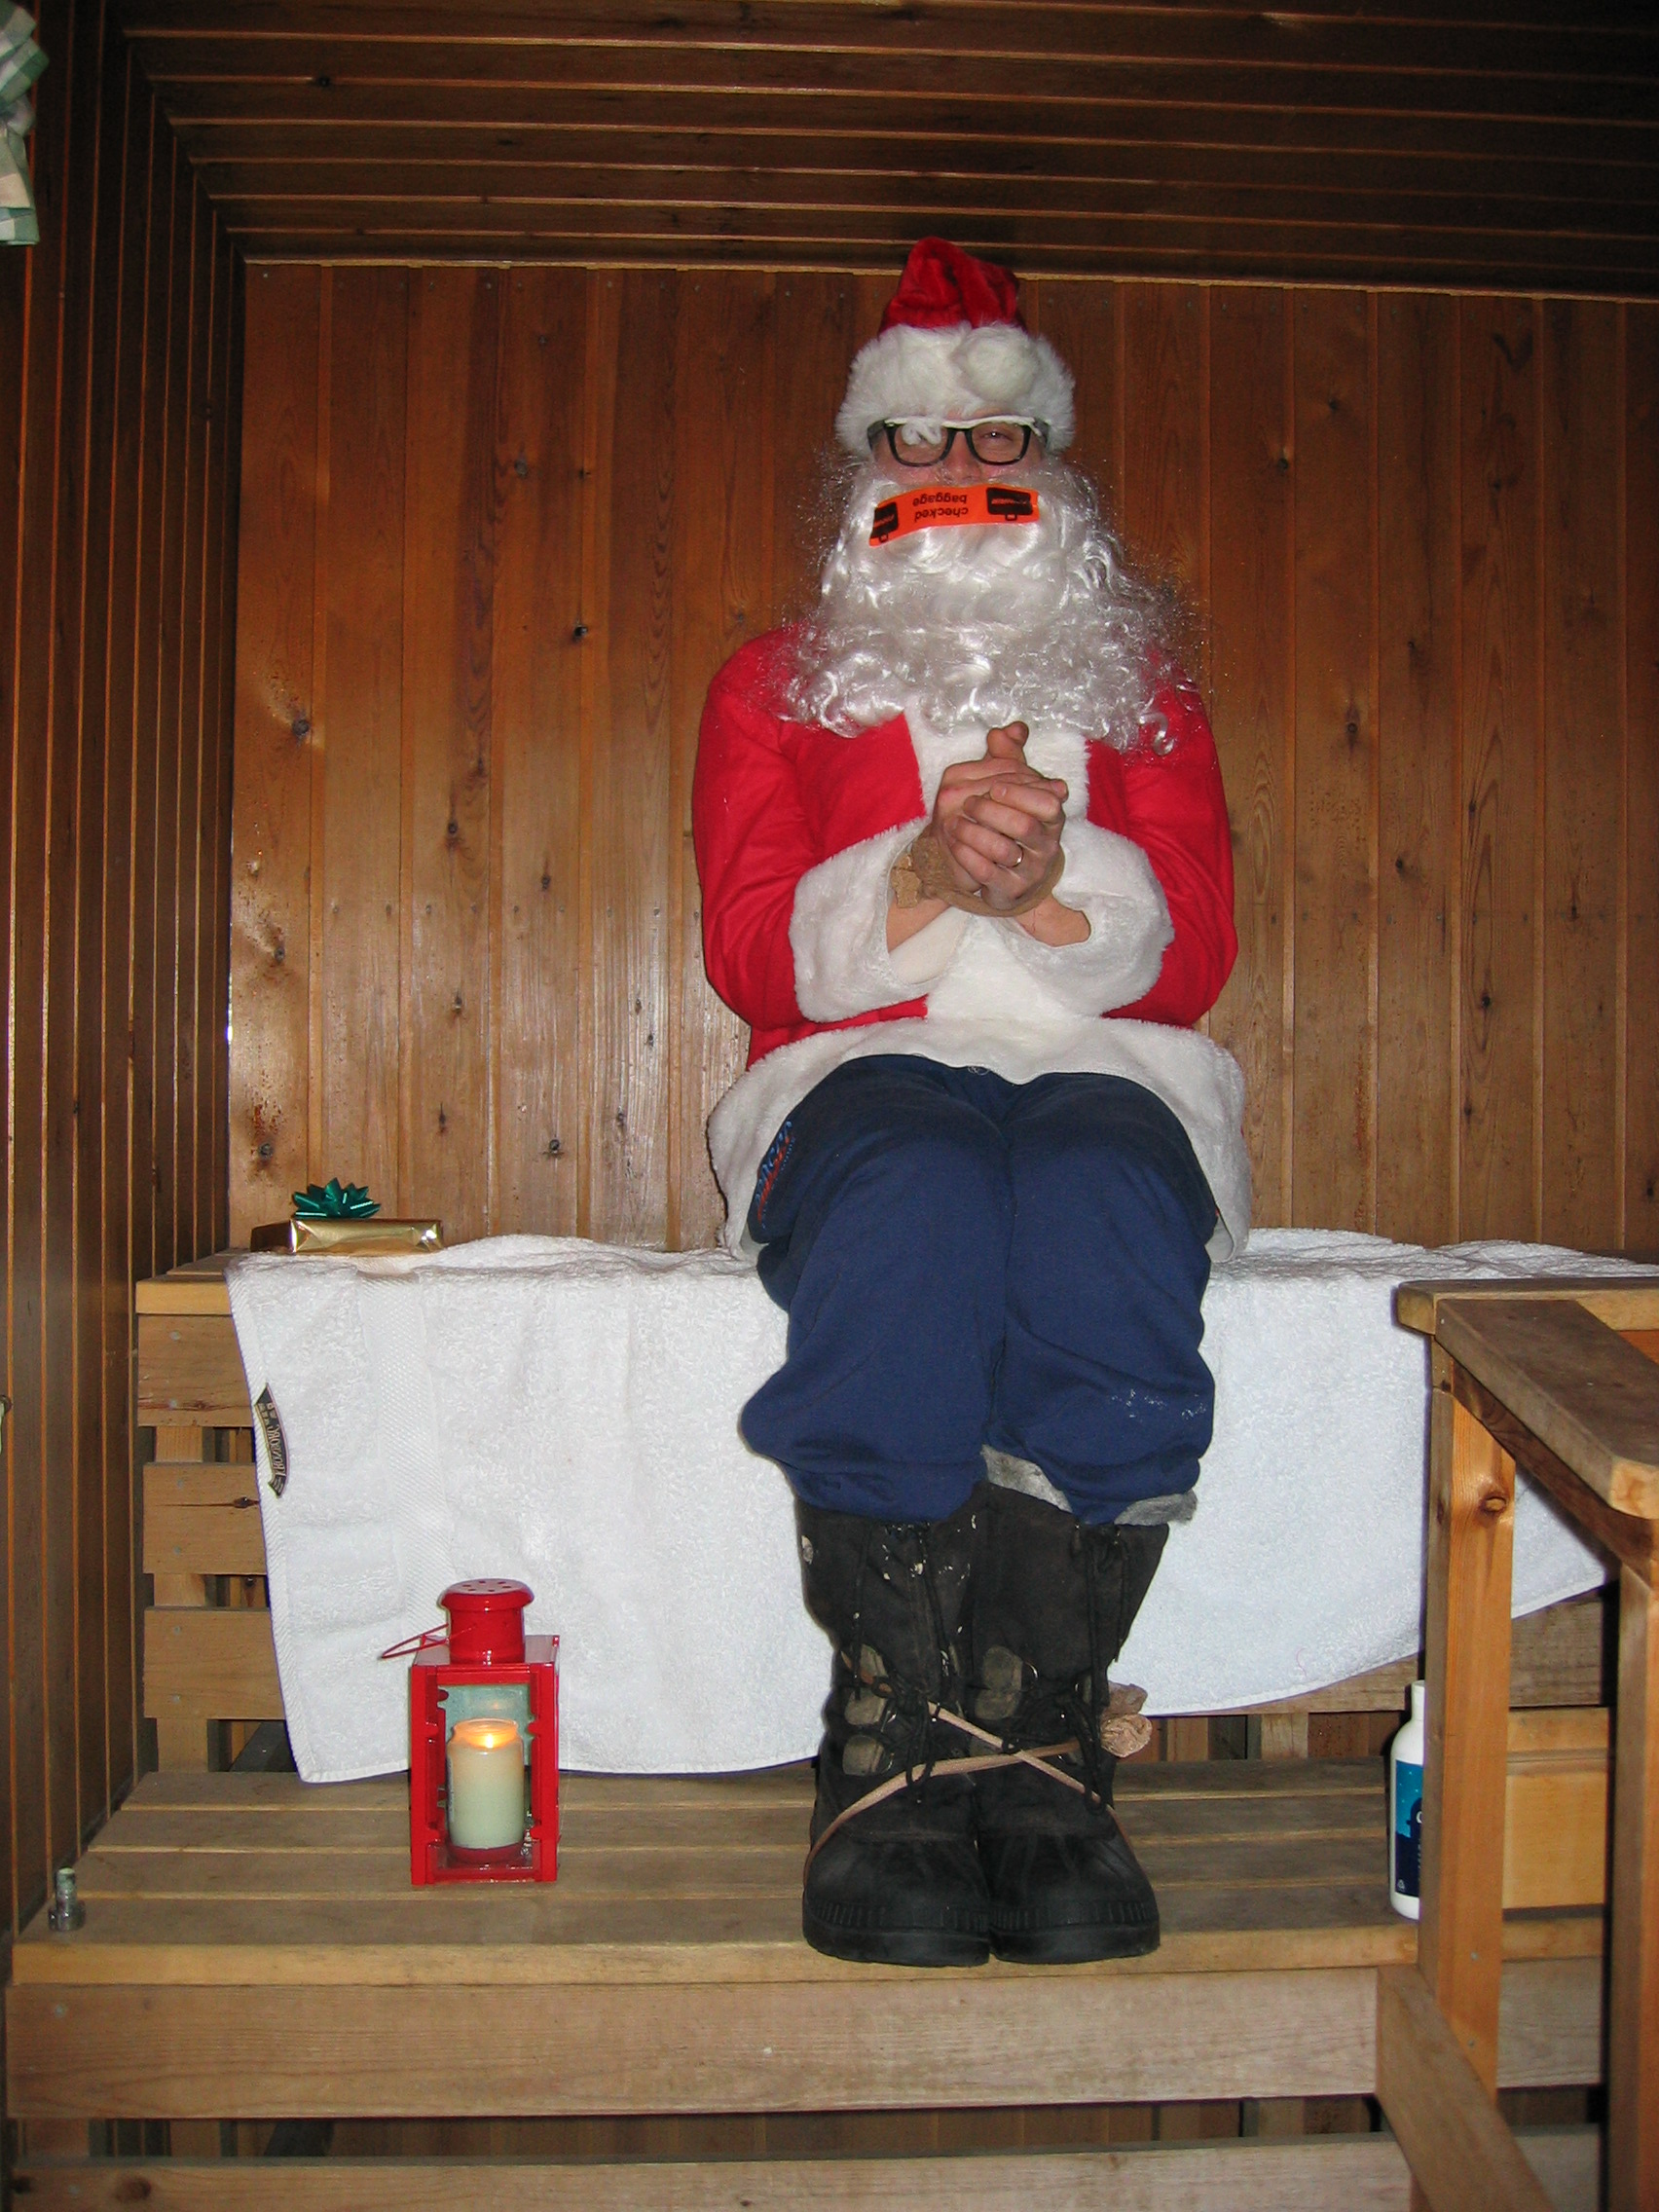 Juluppdrag 2003. Tomten var kidnappad men vi fann honom i bastun!